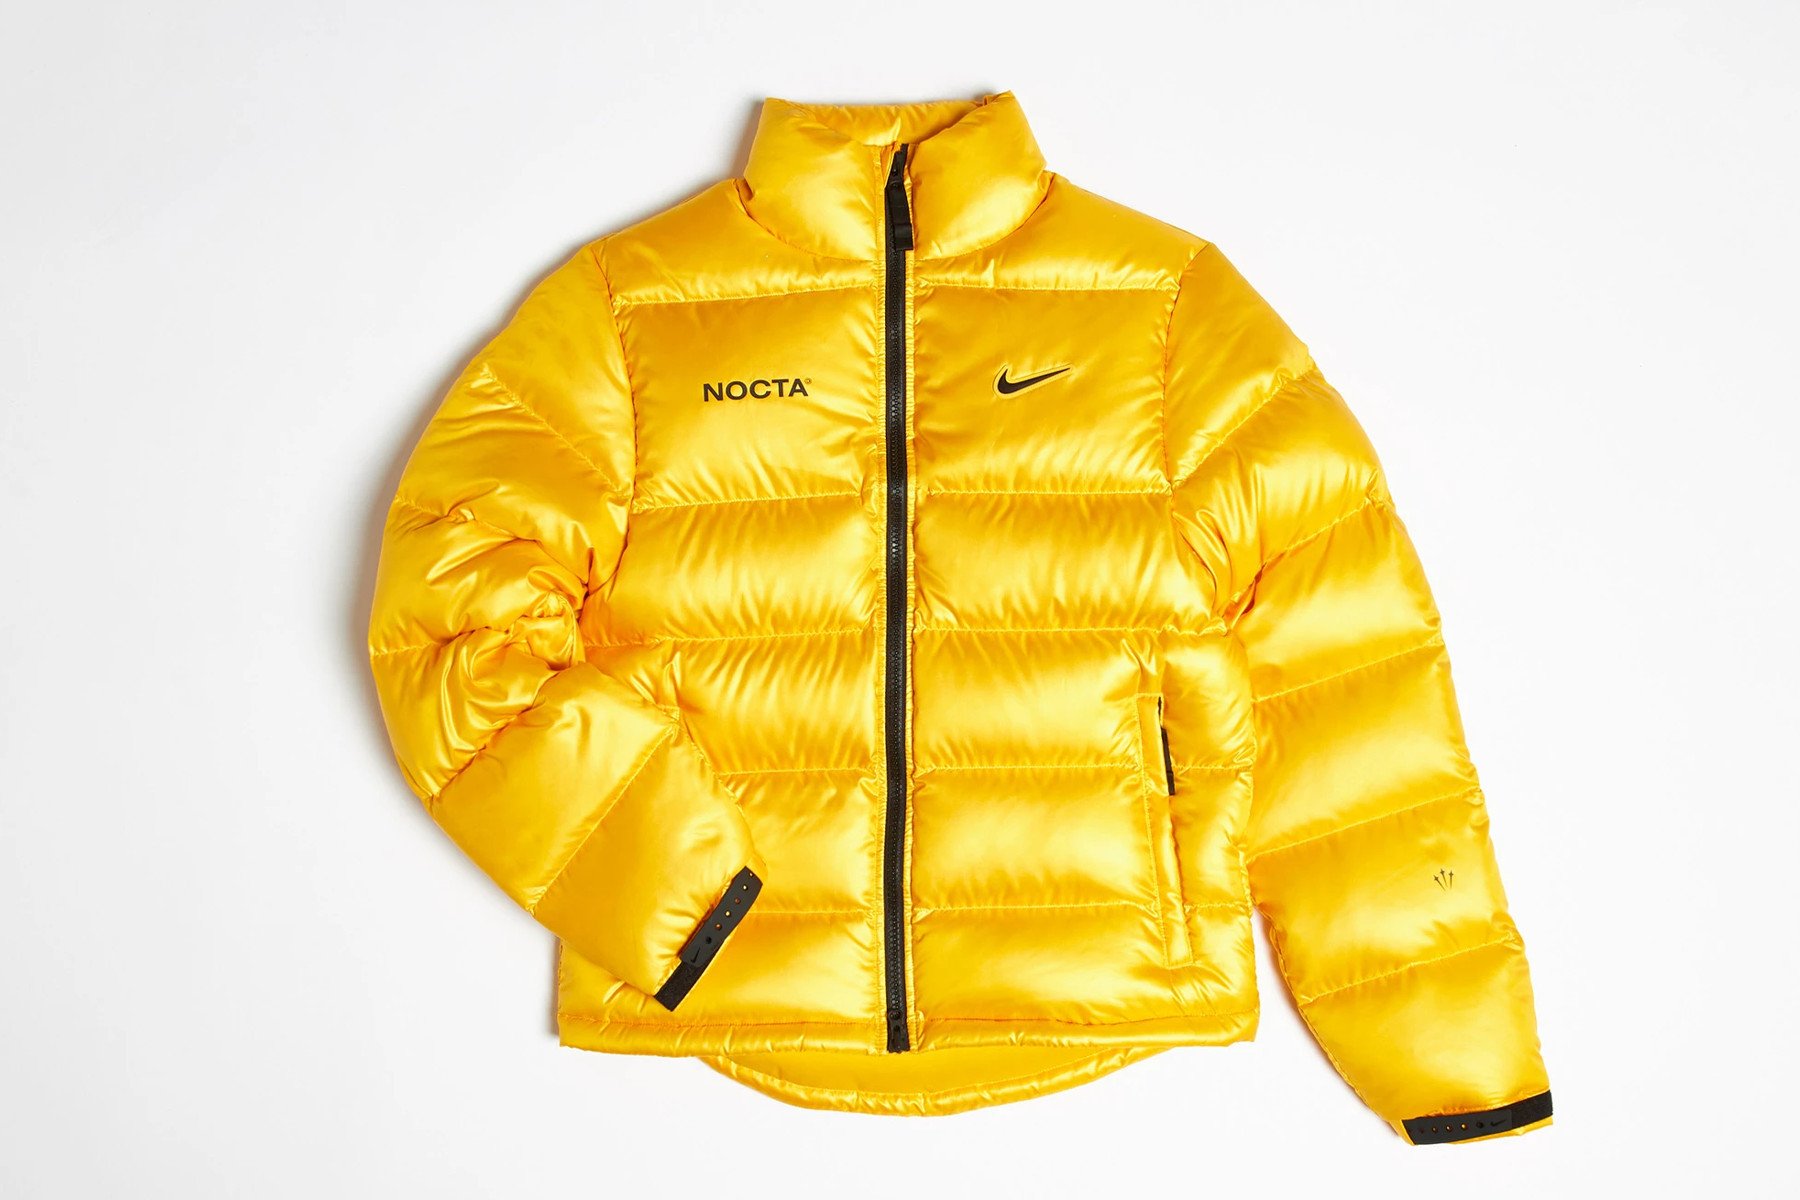 NOCTA x Nike Puffer Jacket University Gold